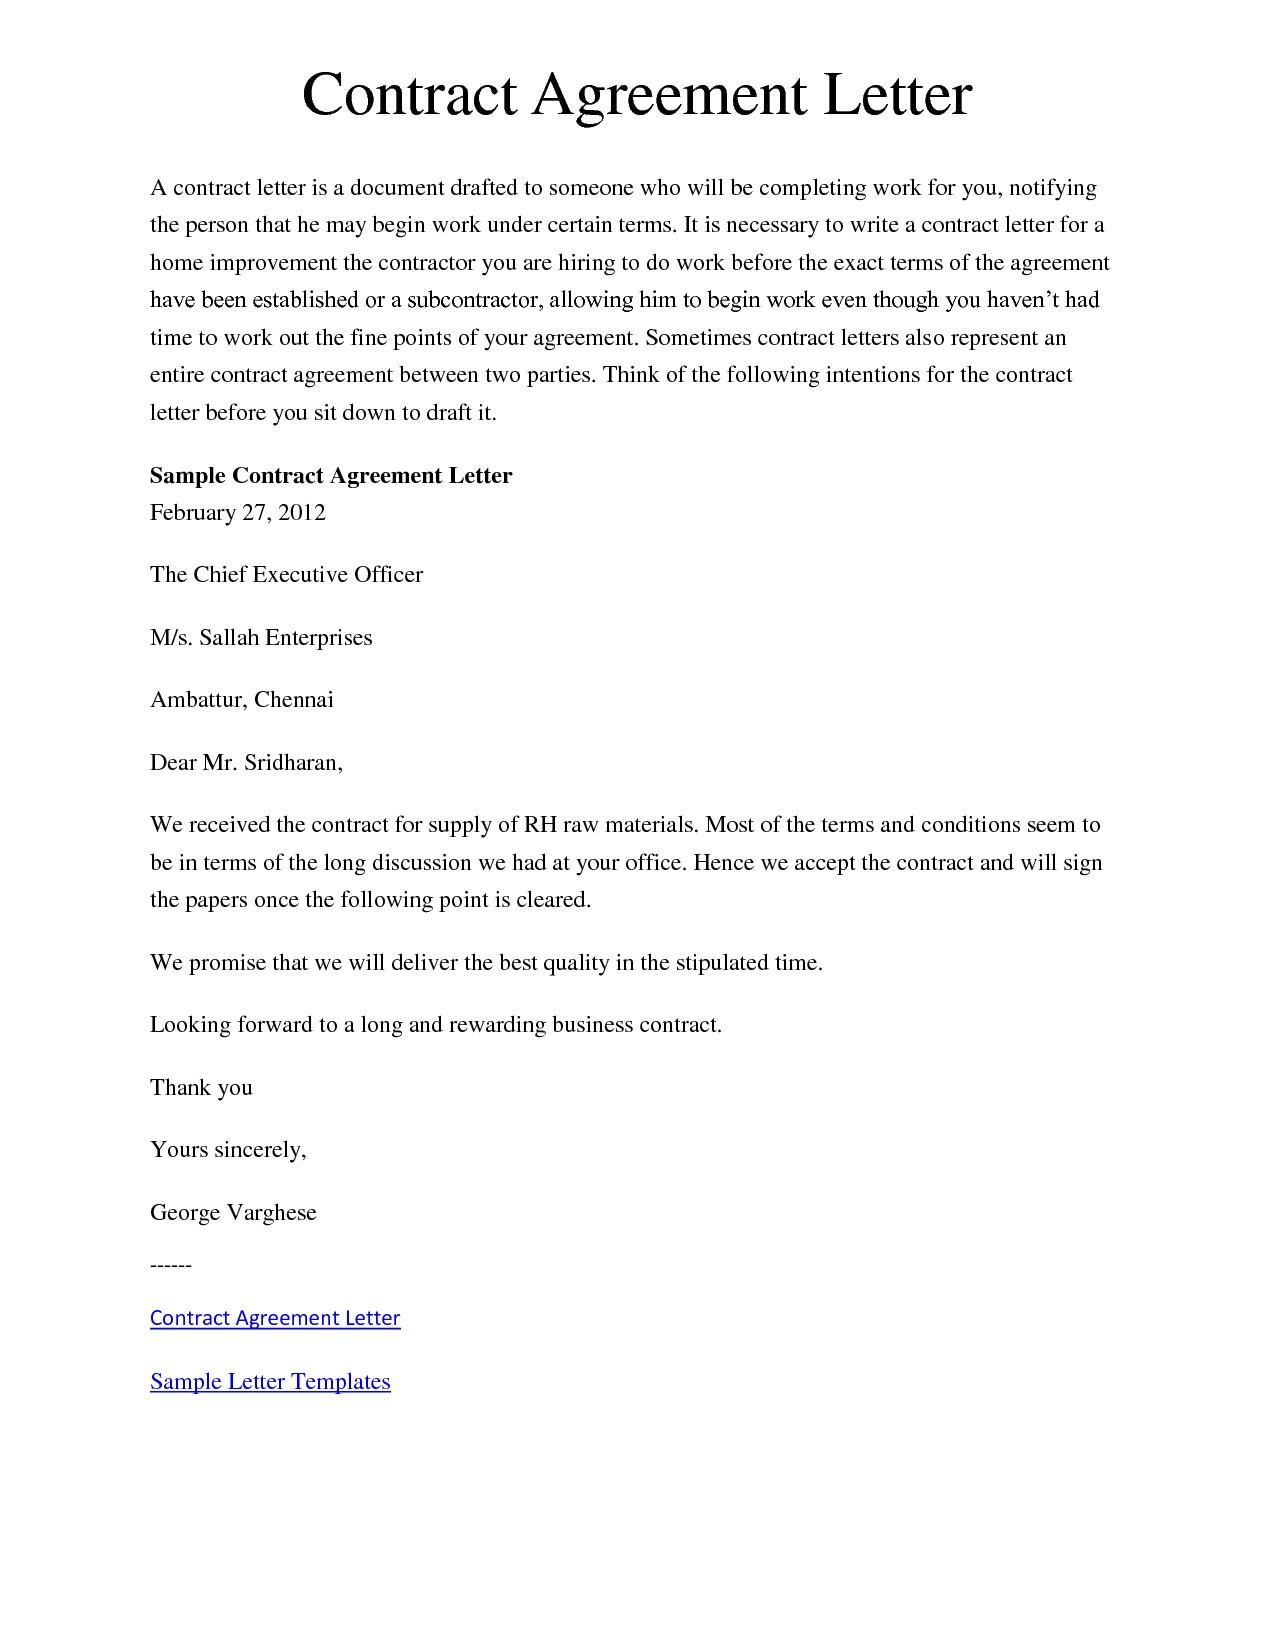 Settlement Agreement Letter Template - Simple Contract Agreement Best Sample Settlement Agreement